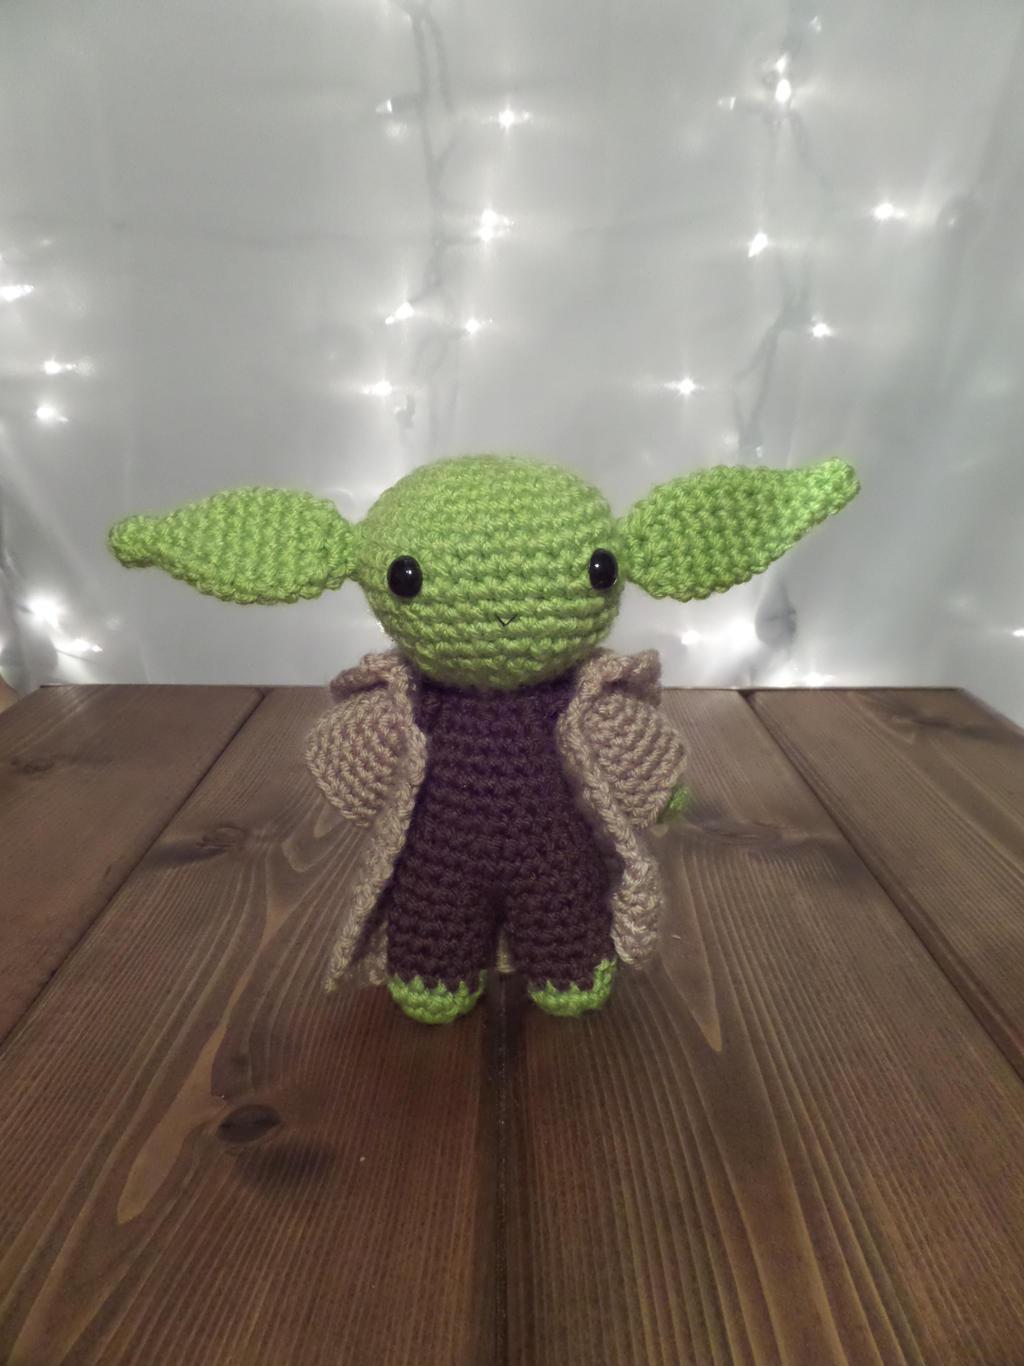 Baby Yoda Inspired Amigurumi (Free Crochet Pattern) - Sweet ...   1366x1024